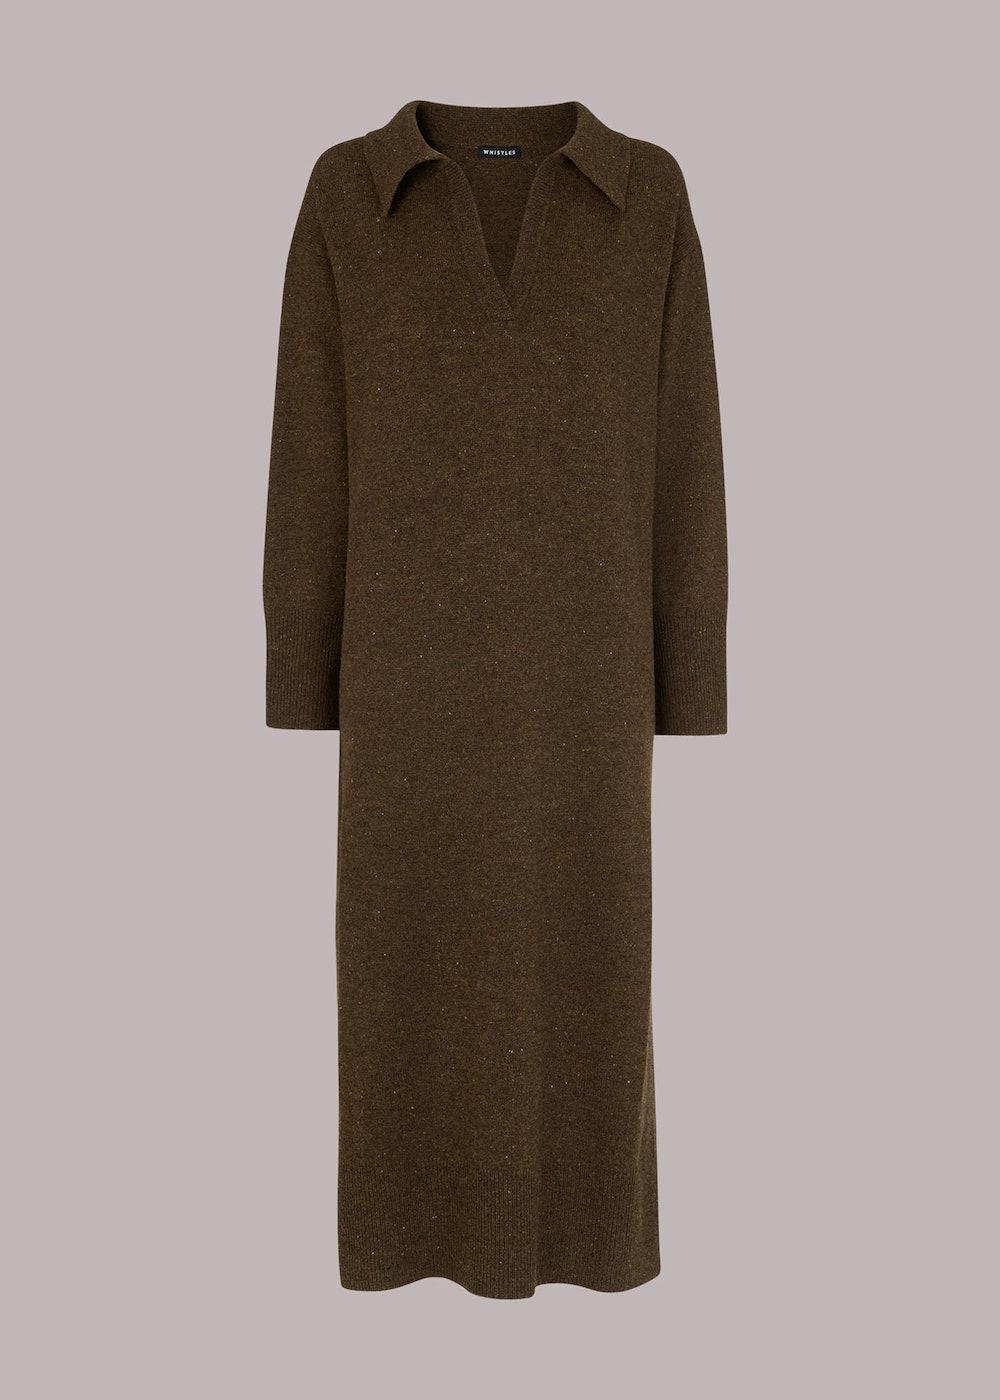 Color Midi Knit Dress